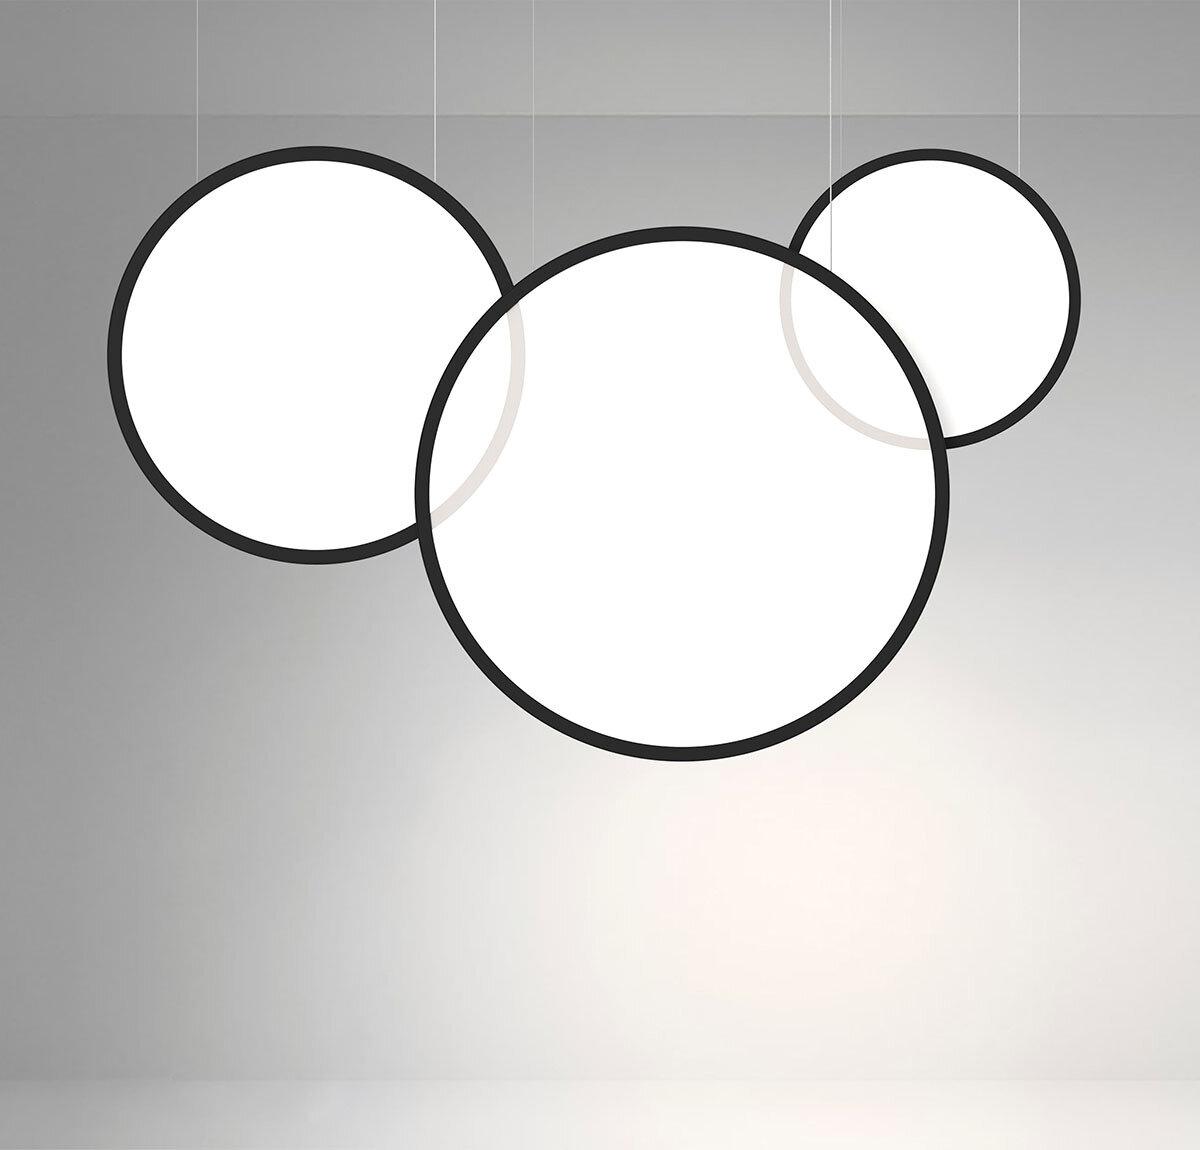 ProLuce® LED Panel TONDO/C Ø507 mm, vert., 36W, 3960 lm, 3000K, DALI, 100°, schwarz